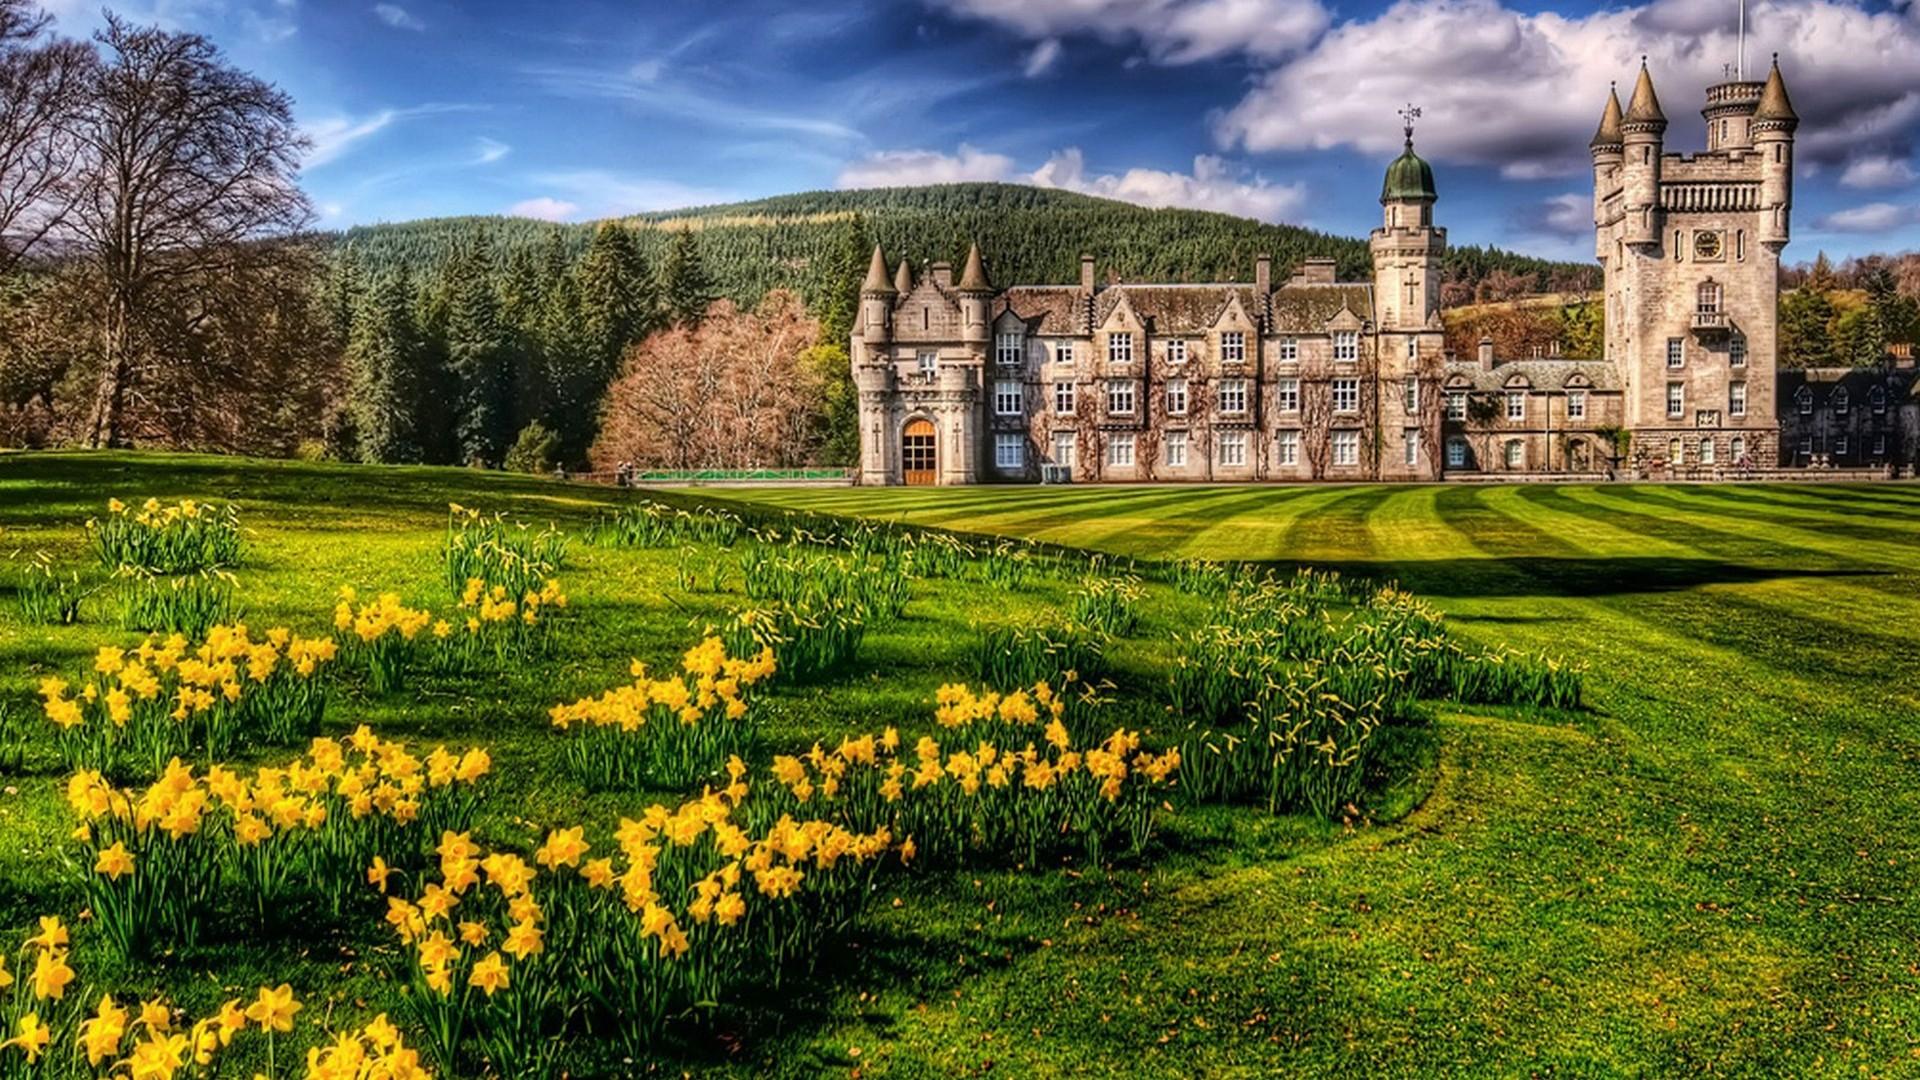 Castle in england full hd fond d 39 cran and arri re plan for Fond ecran uni